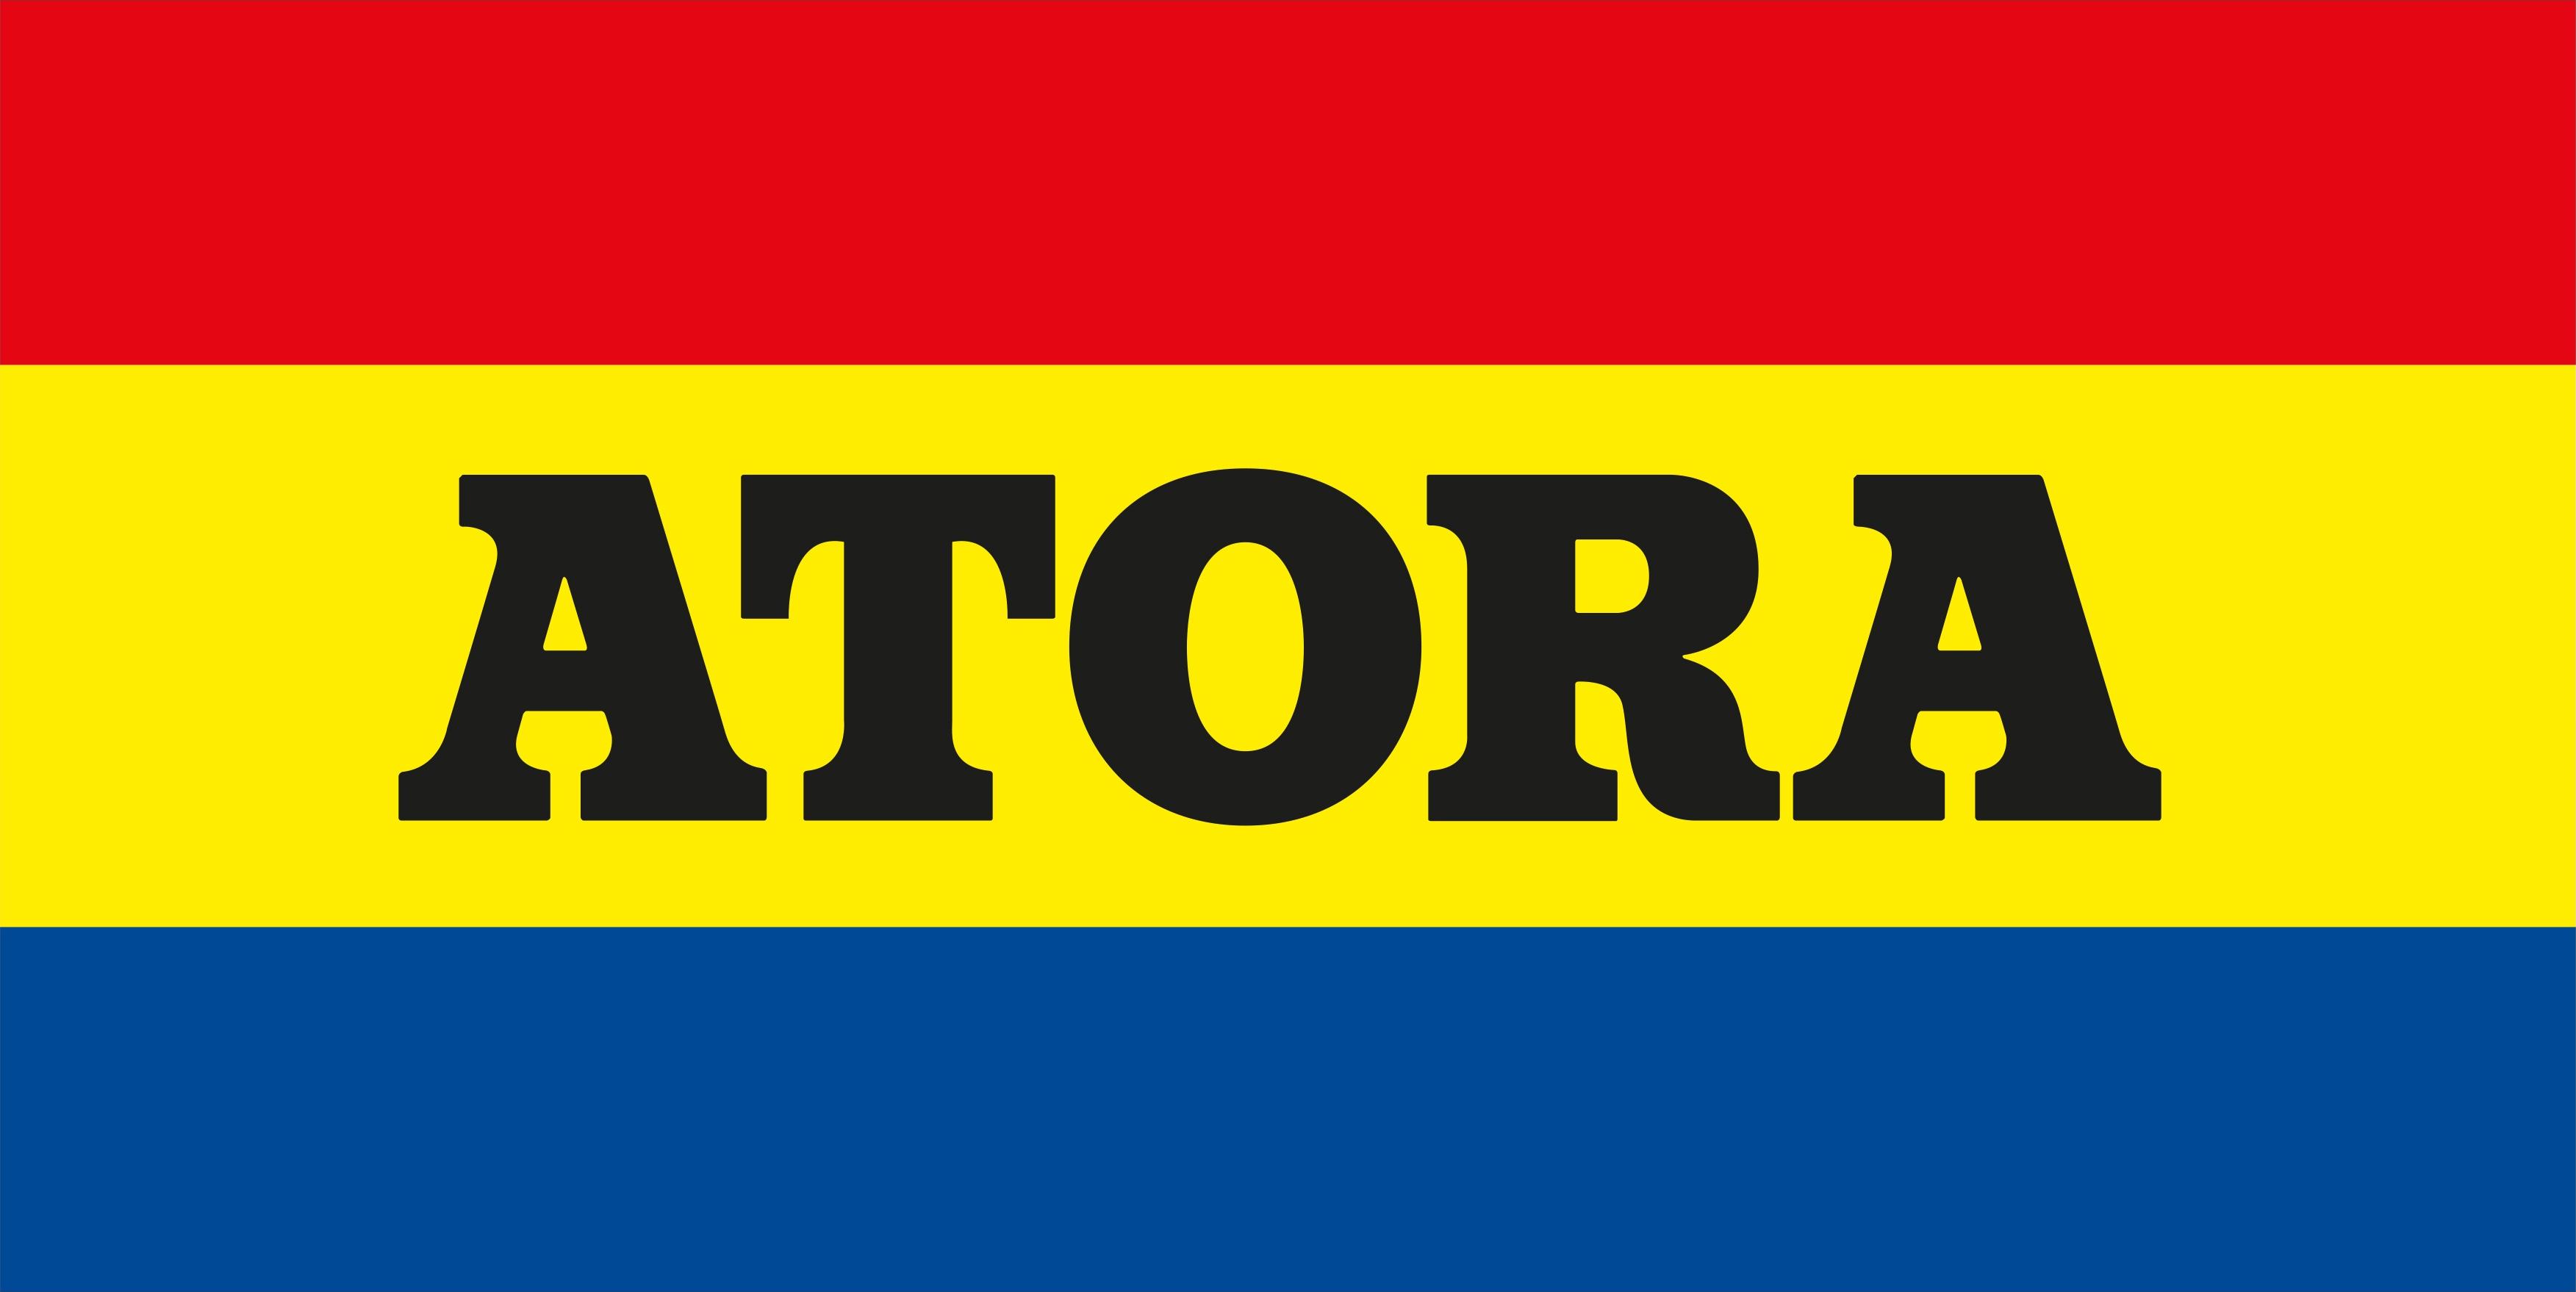 Atora